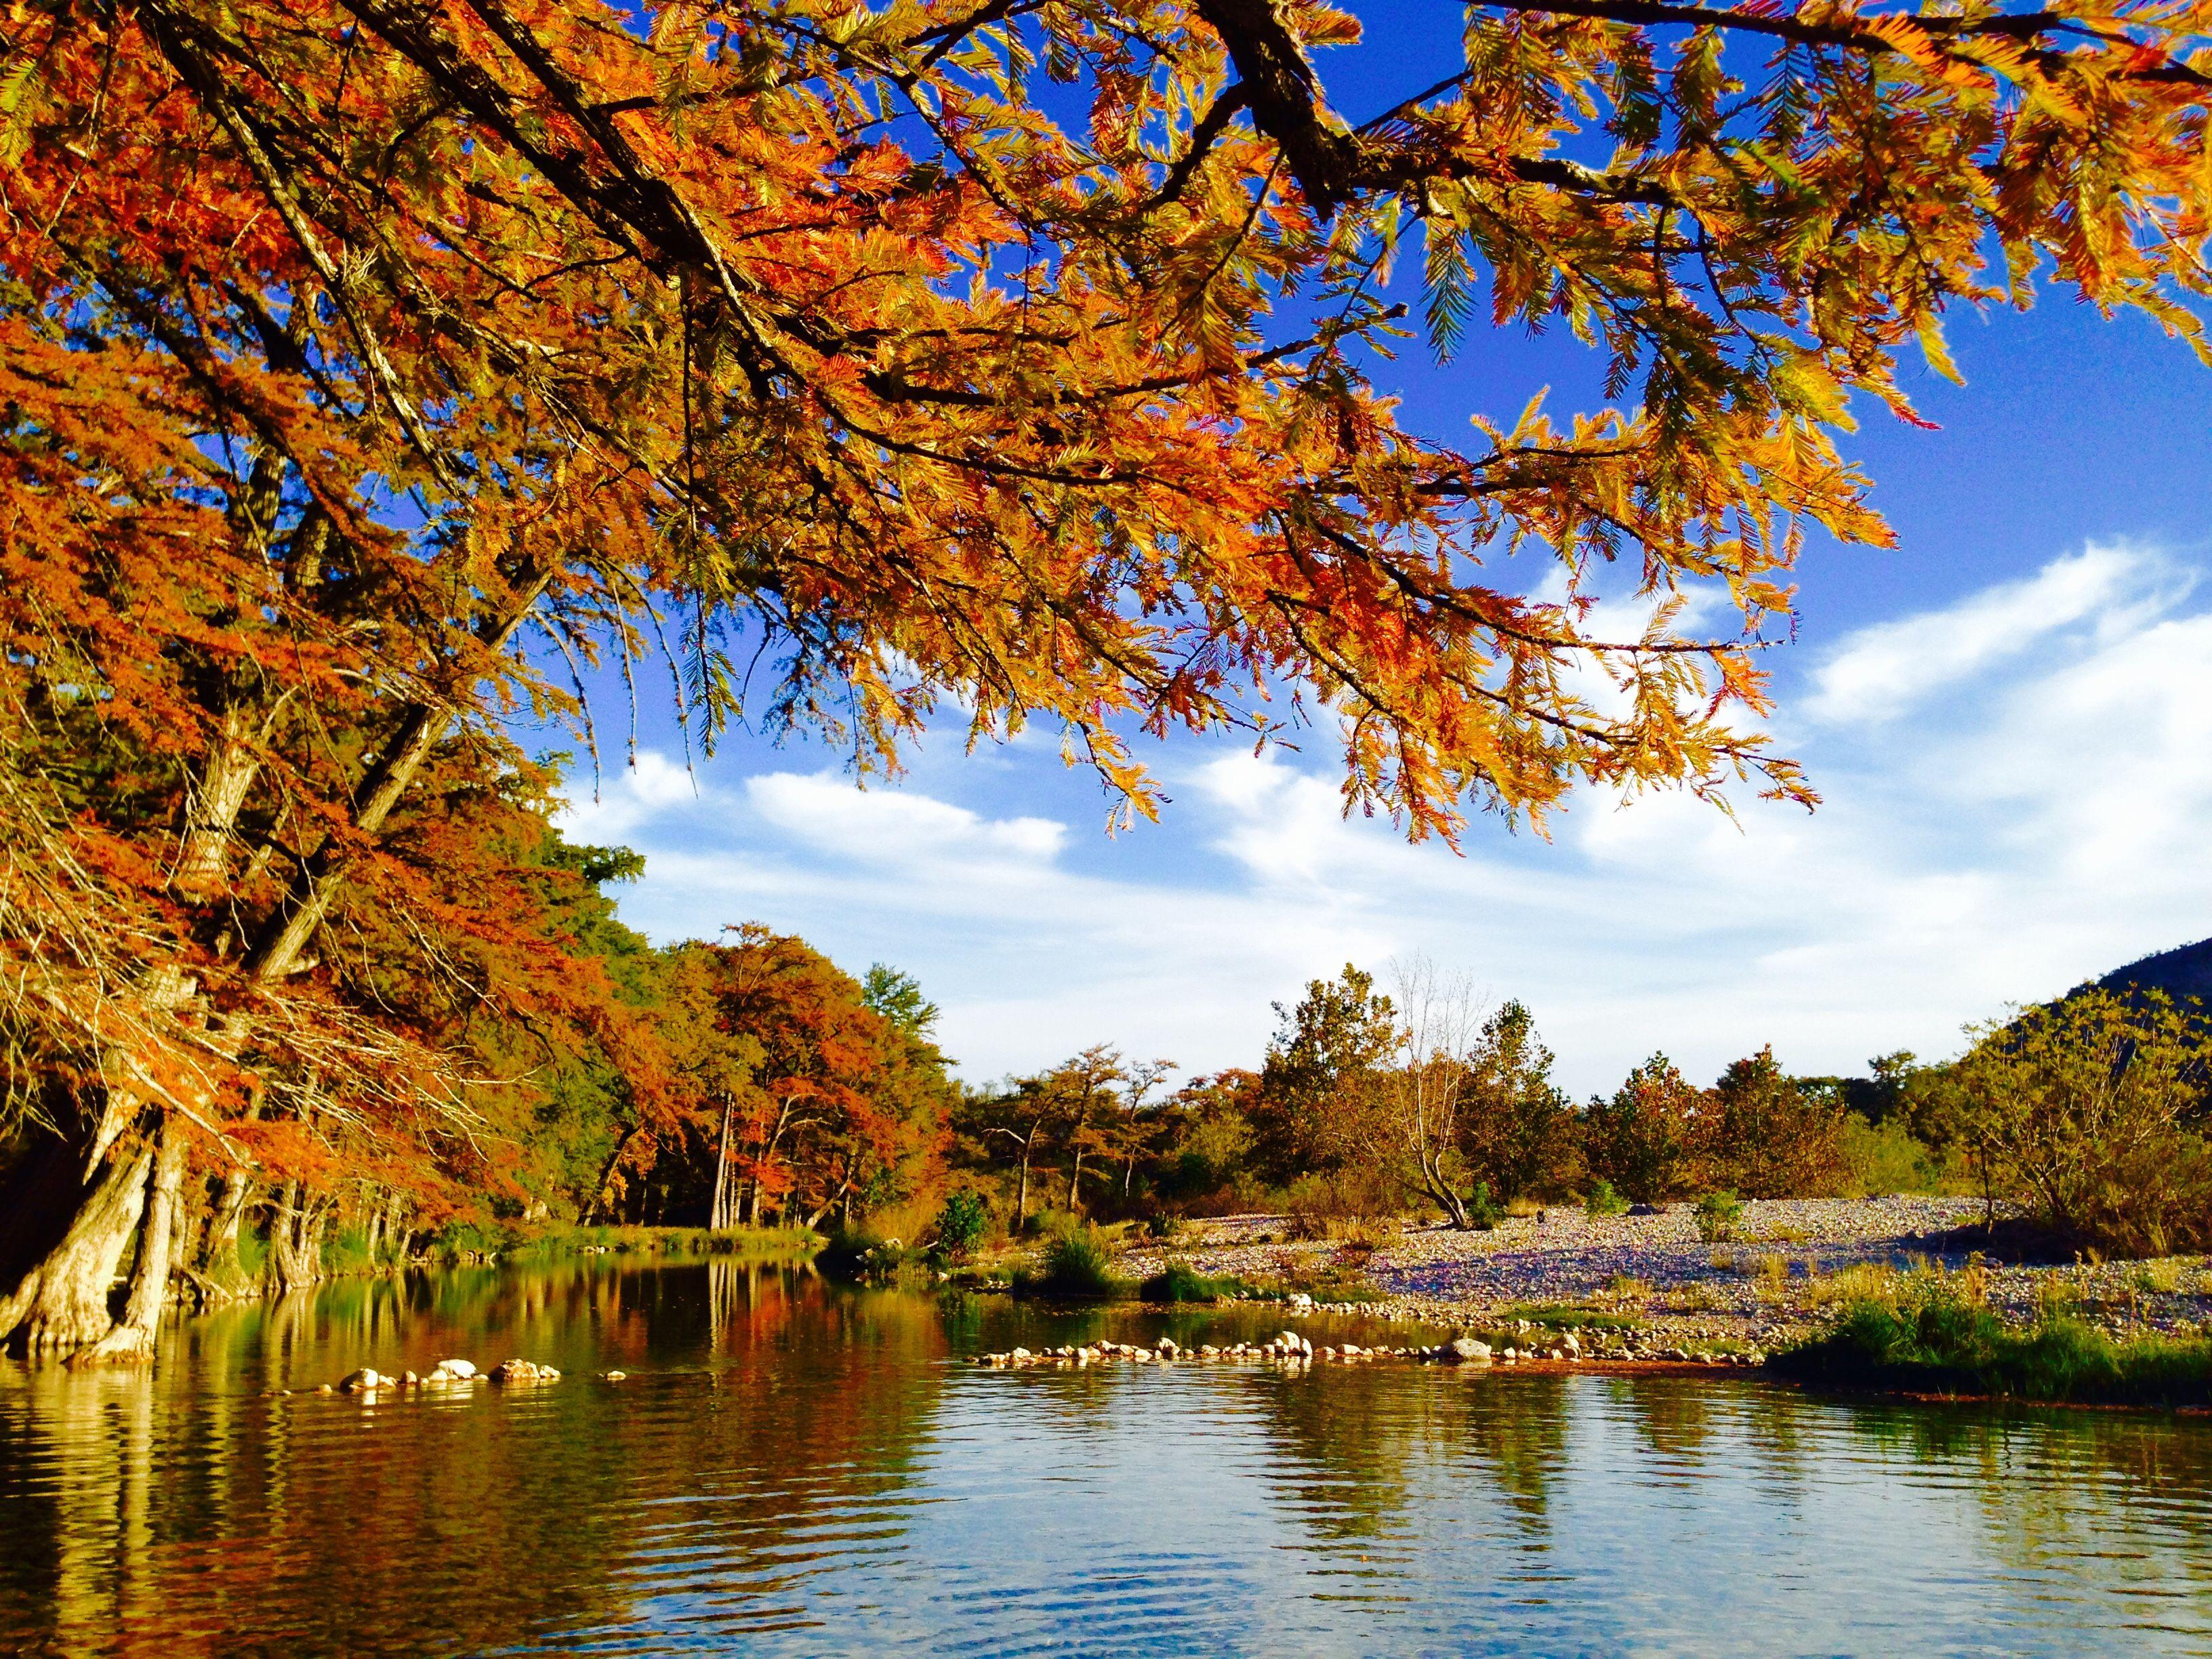 Rio Frio River in Garner State Park, Texas